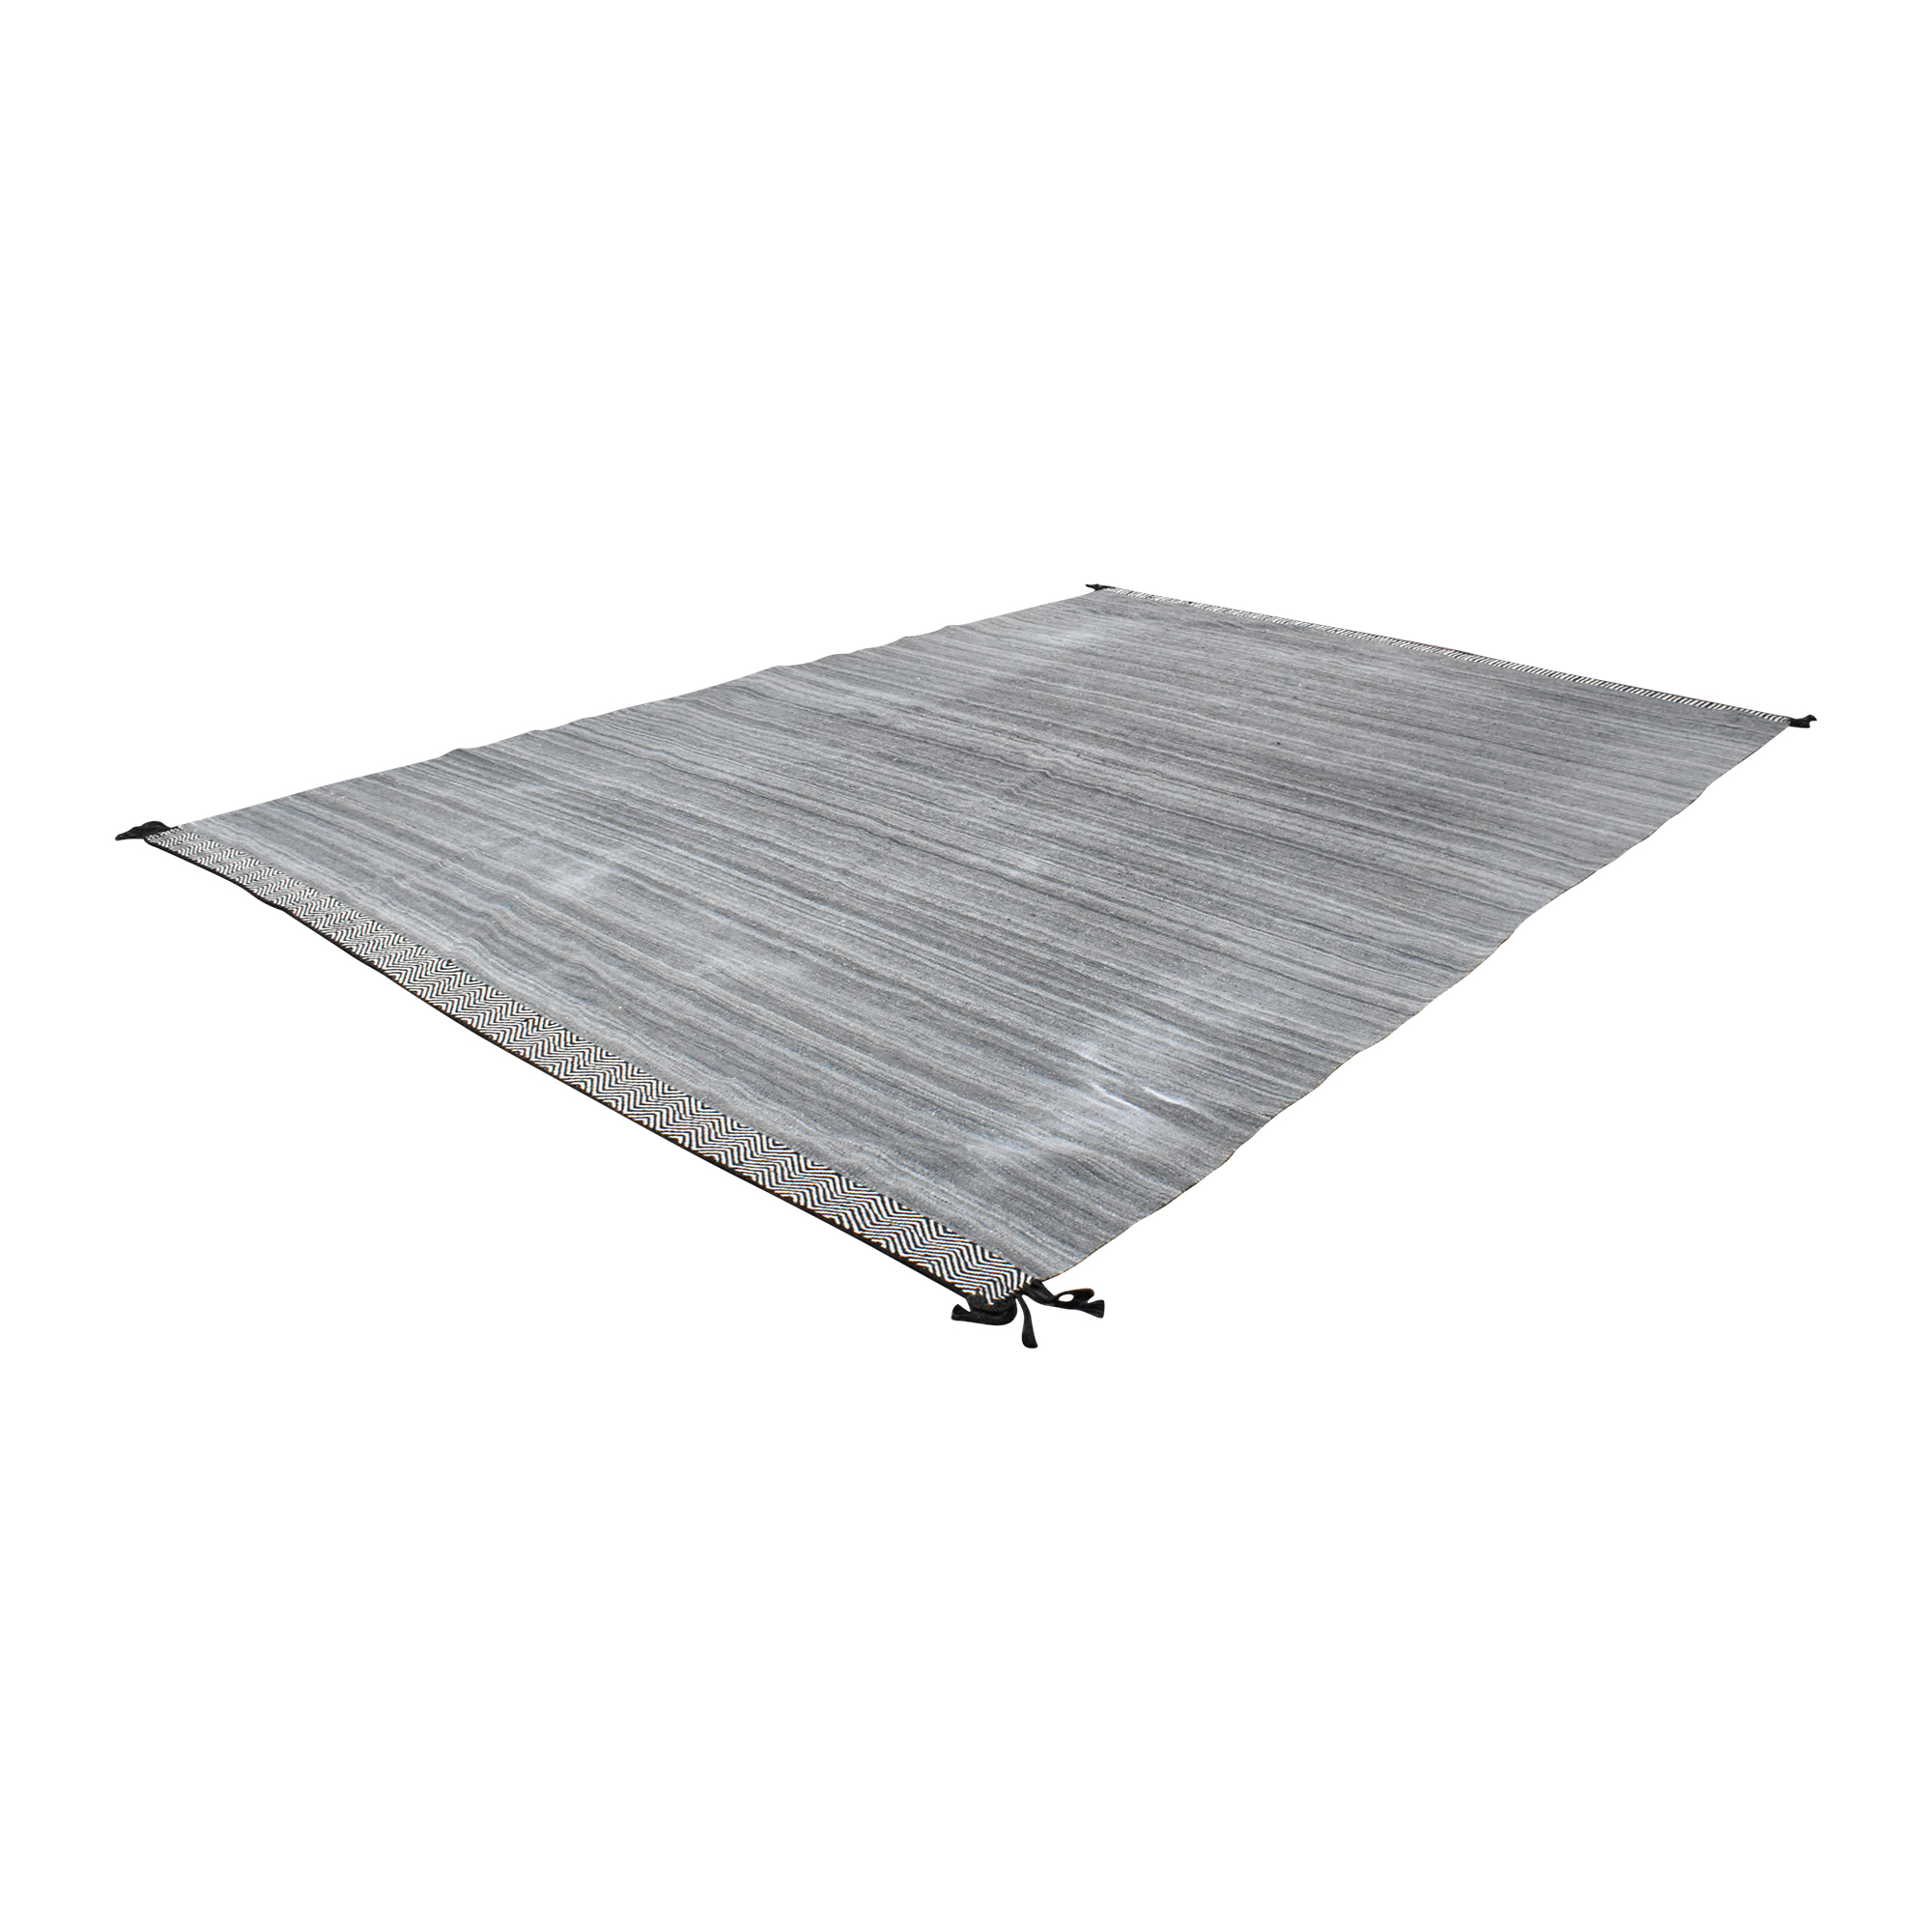 ABC Carpet & Home ABC Carpet & Home Flat Weave Area Rug nj